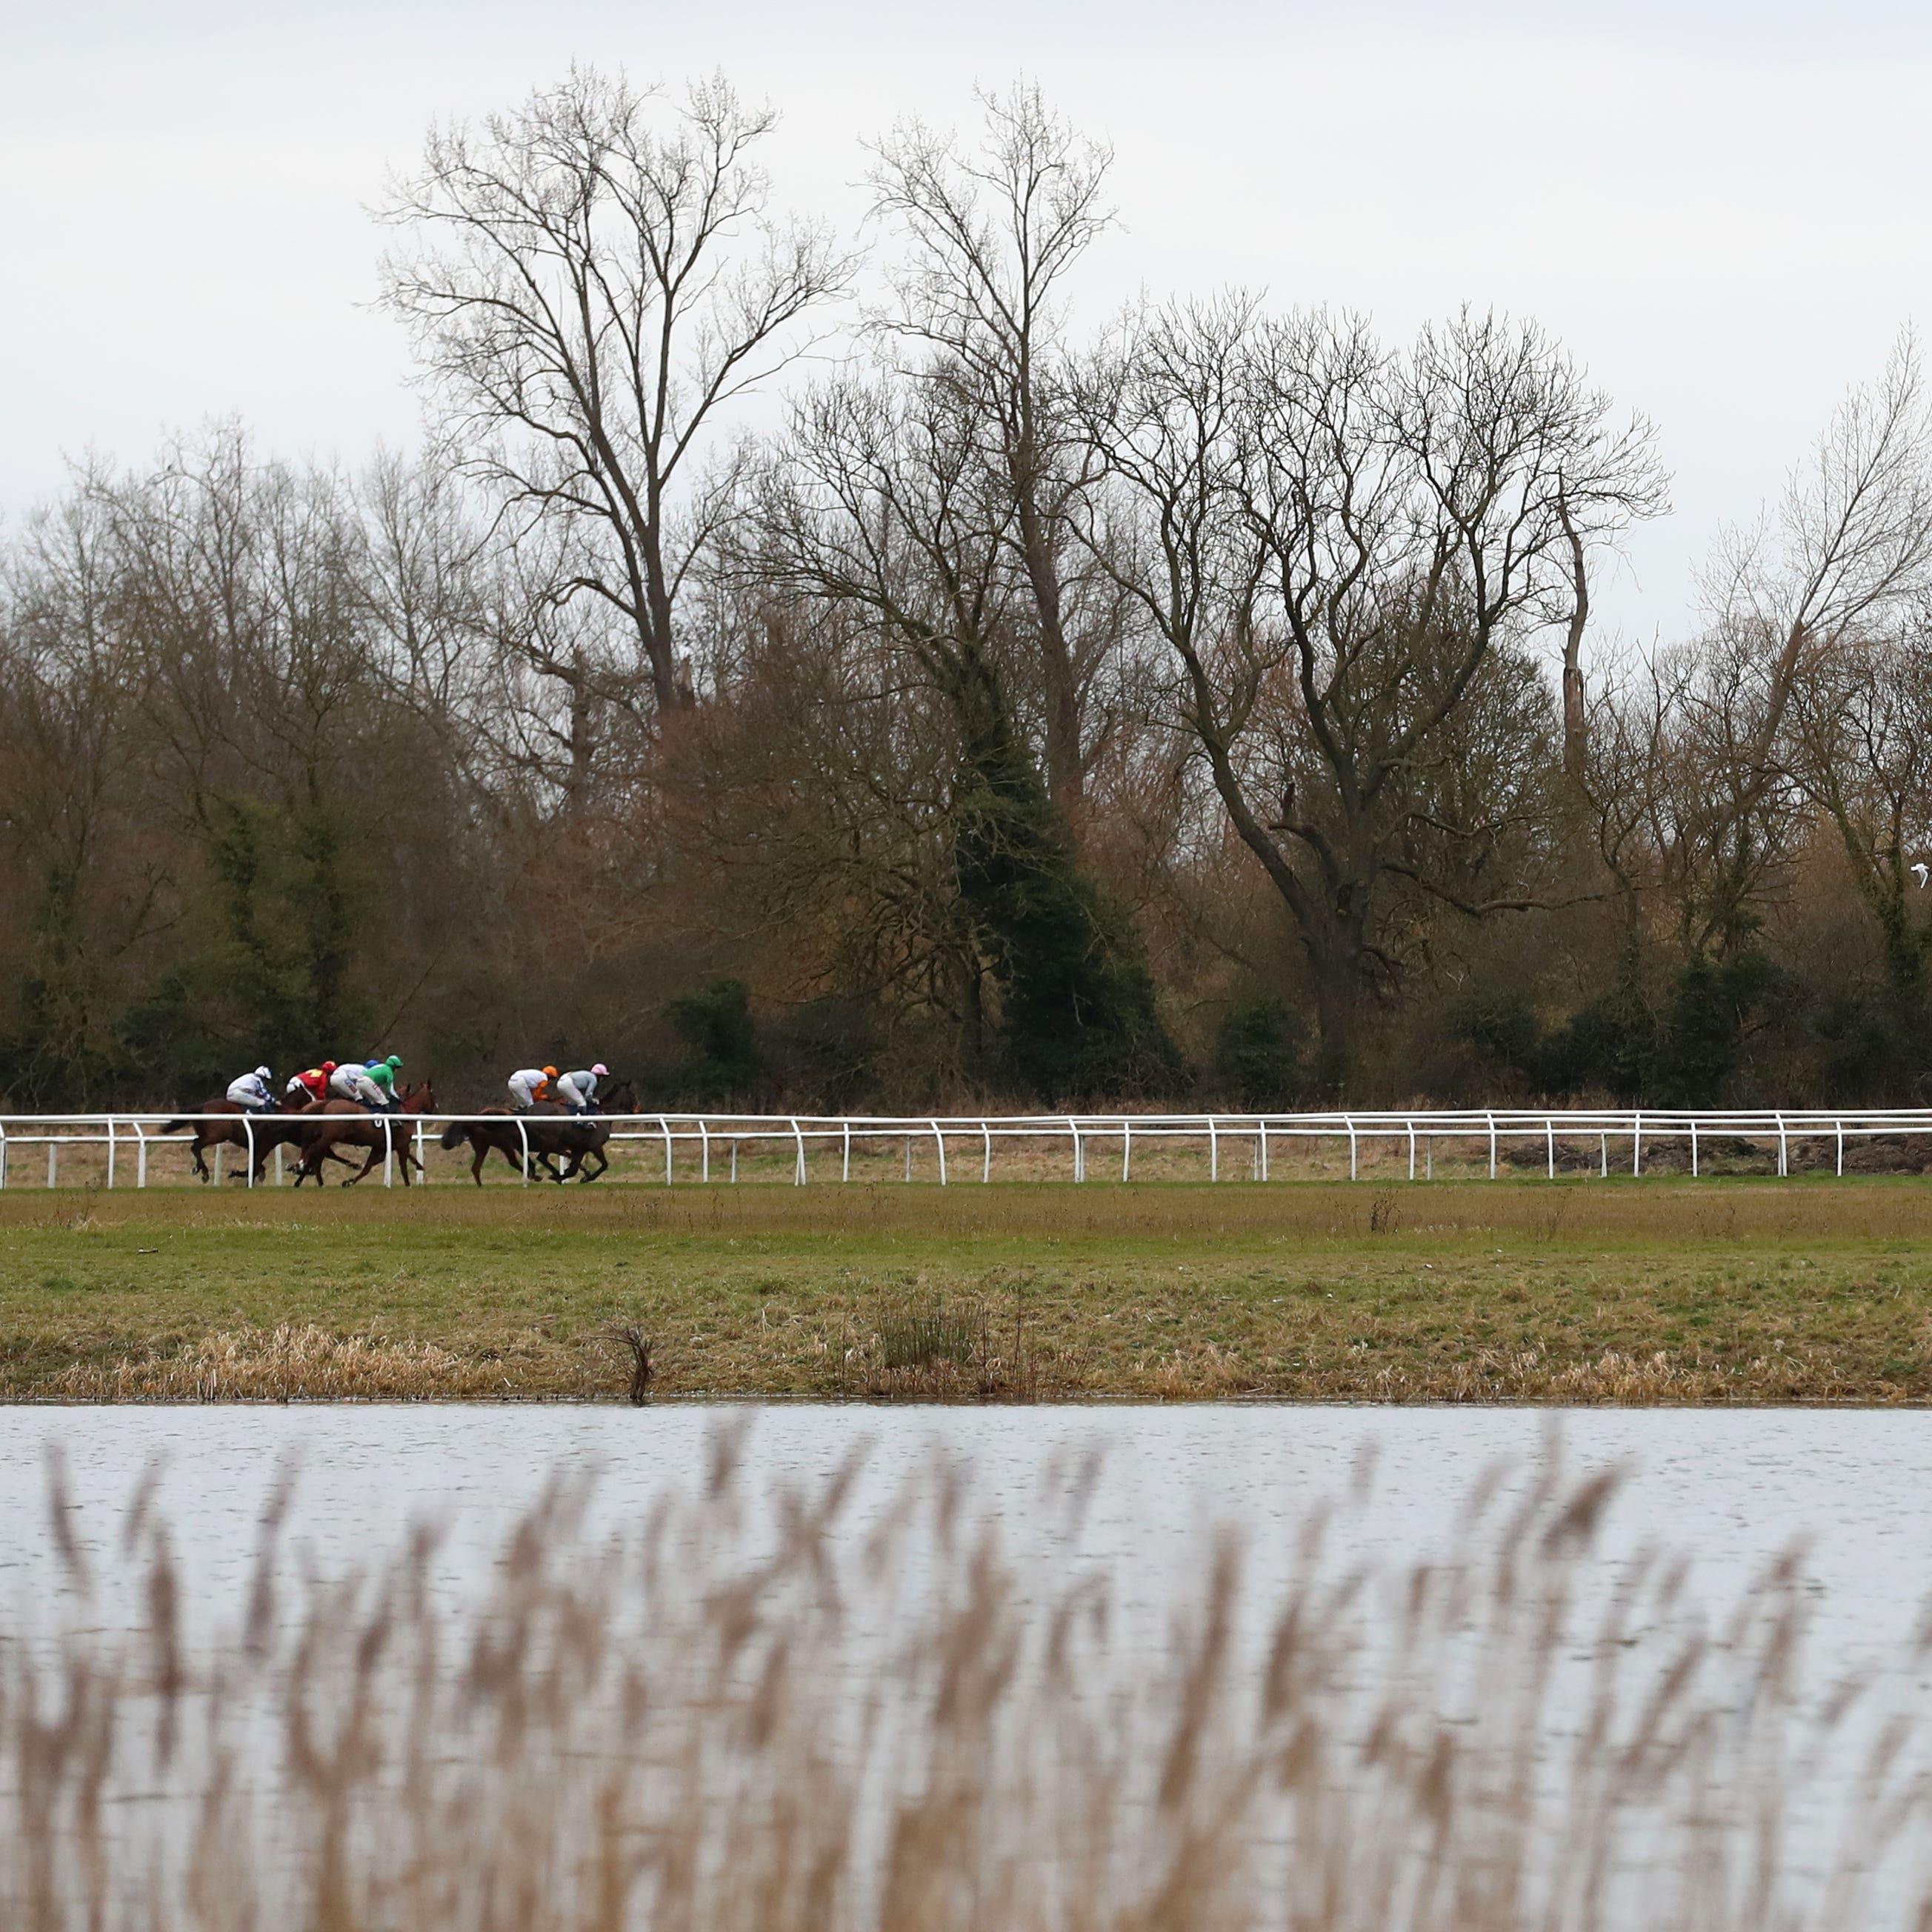 Briery Express may head to Huntingdon